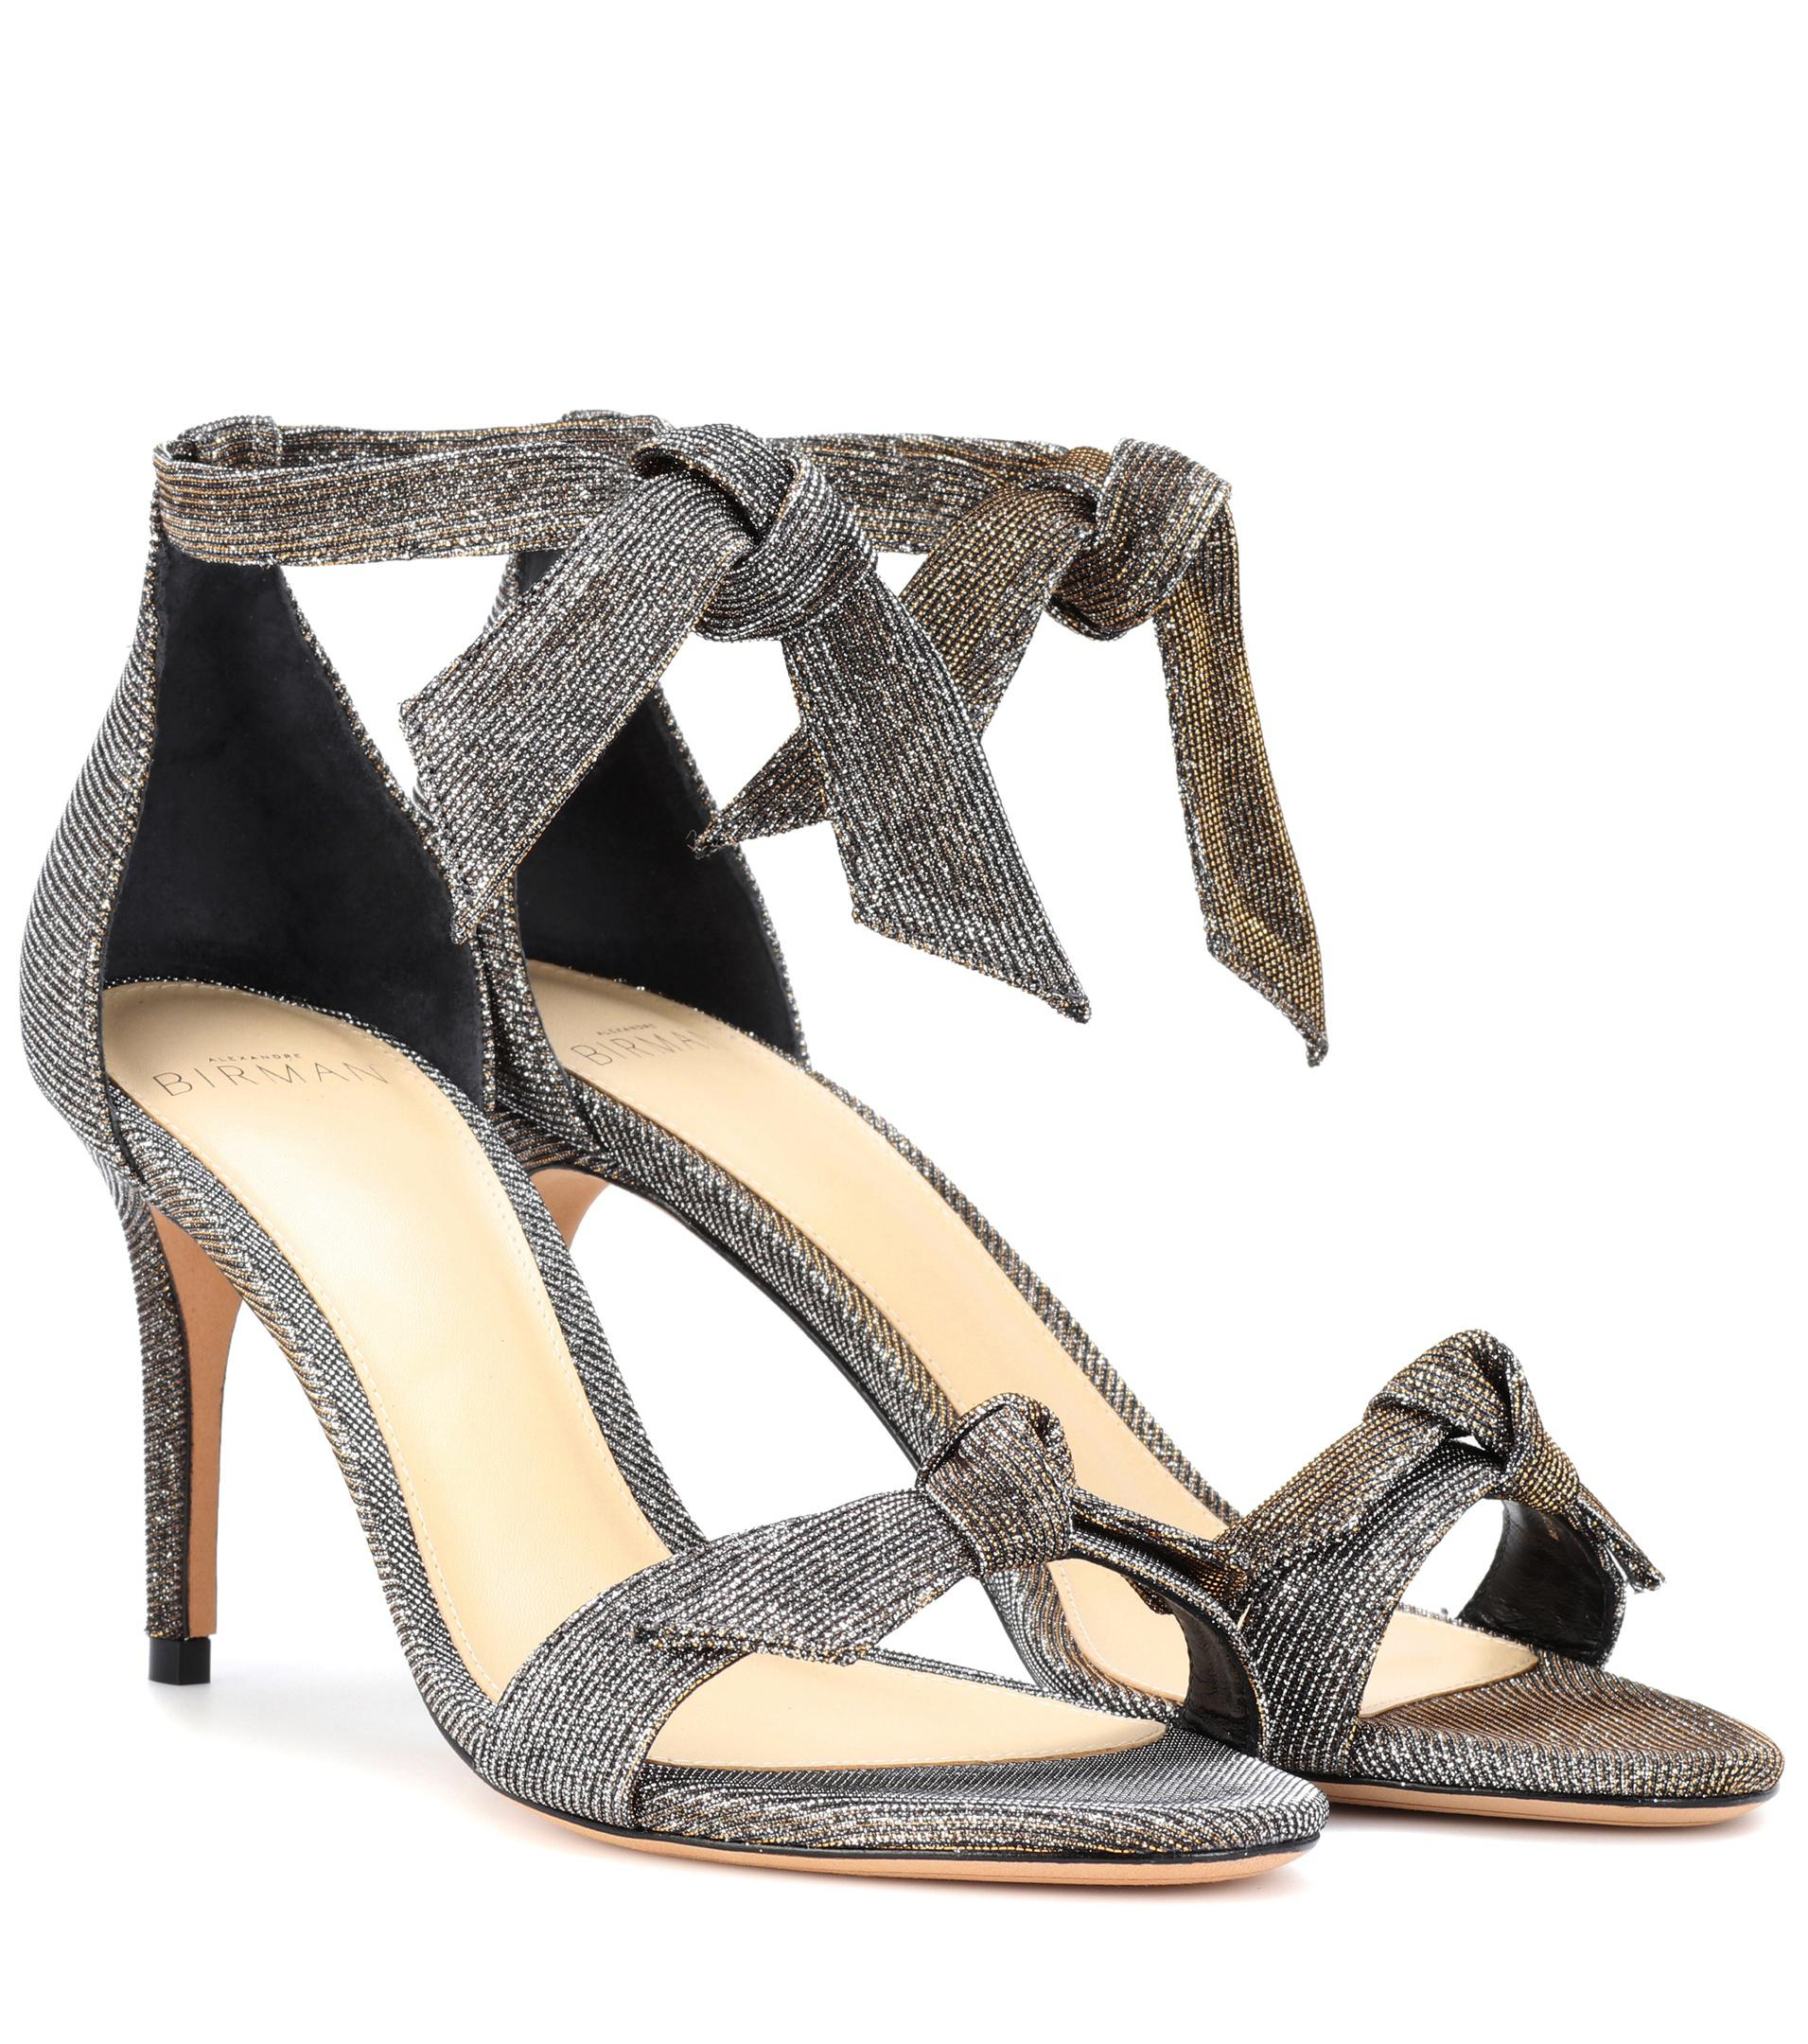 ALEXANDRE BIRMAN Clarita 75 Heels in Metallics. pAJfnd